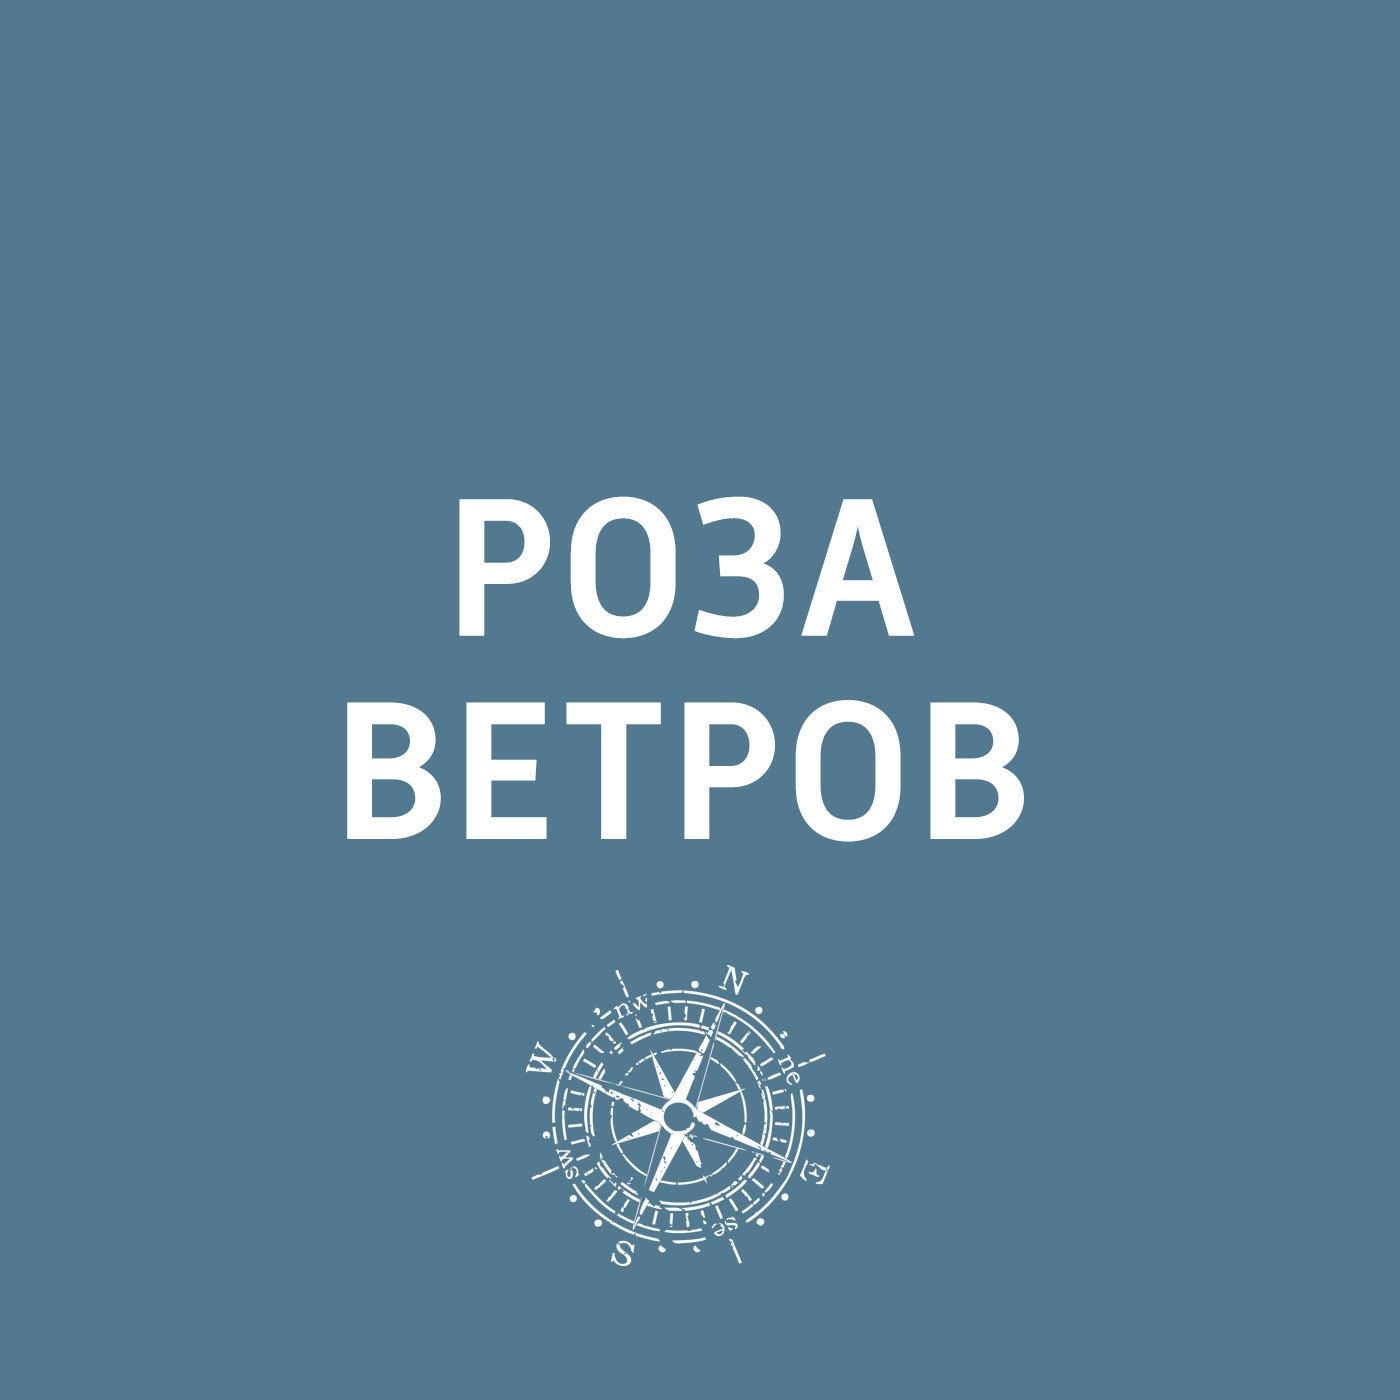 Творческий коллектив шоу «Уральские самоцветы» РЖД в августе запустят вагоны с детскими купе на маршруте Москва-Анапа printio анапа